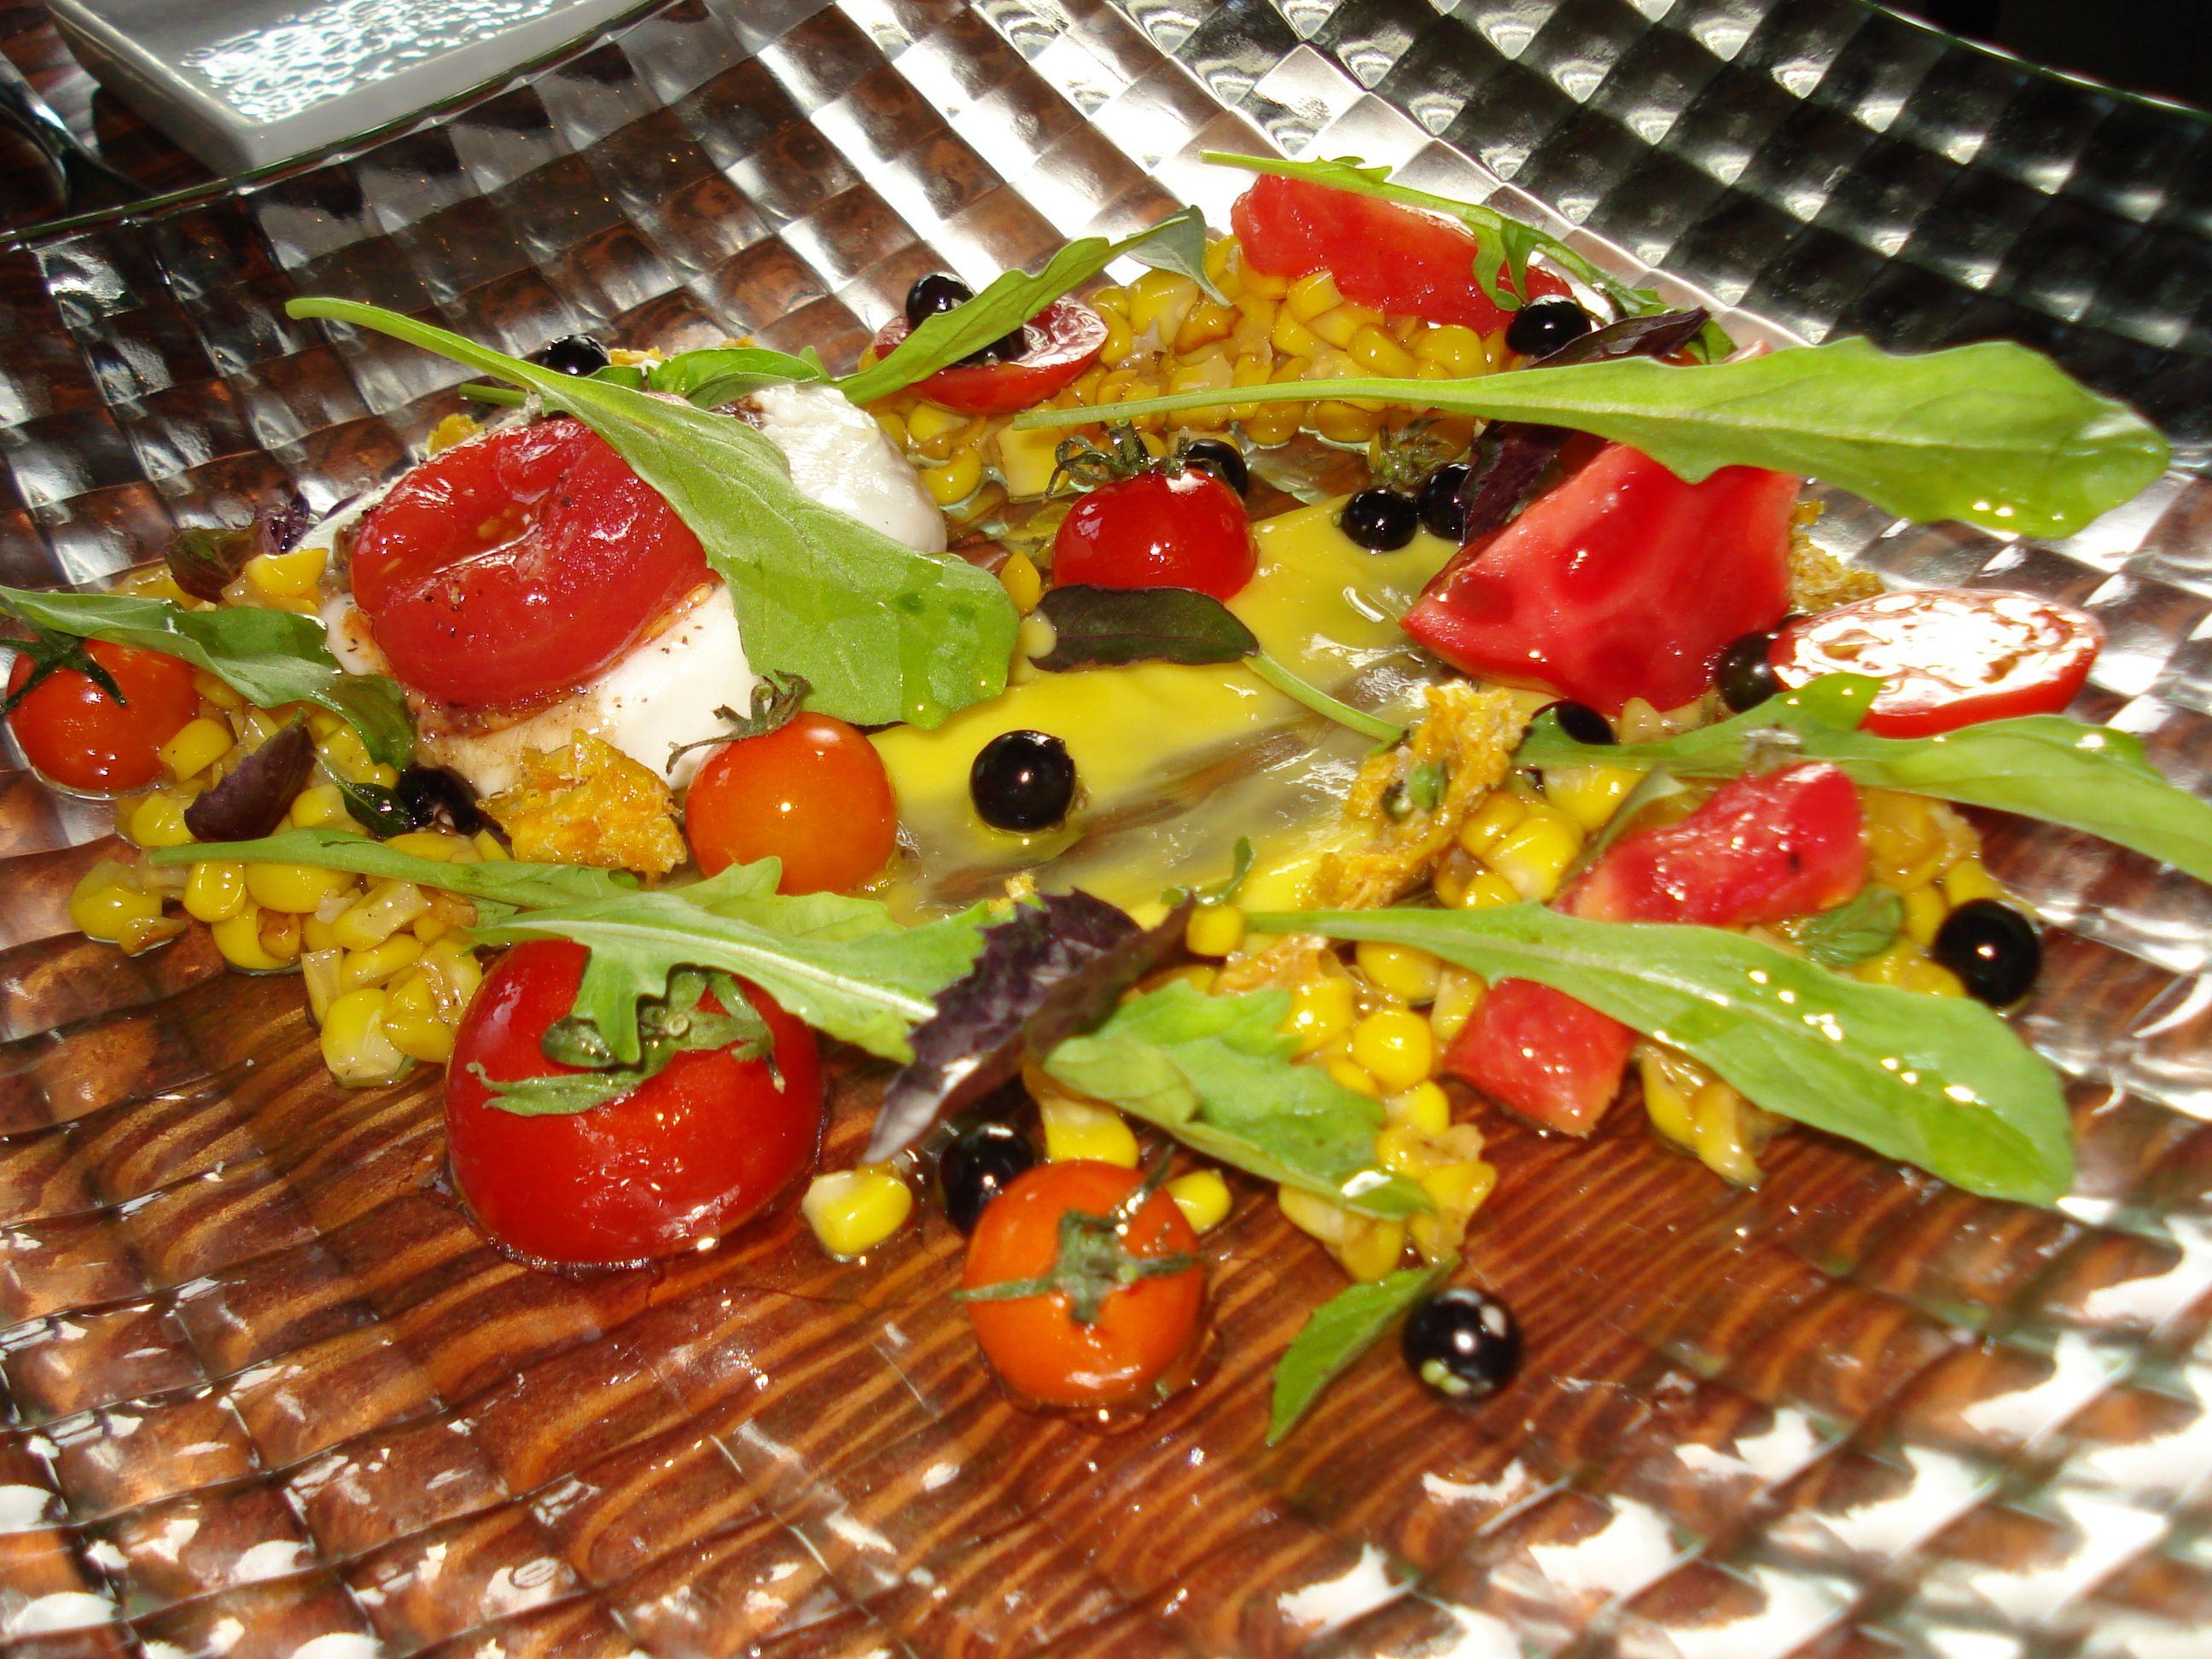 Ubuntu: A Healthy, Organic Napa Valley Restaurant   Awesome